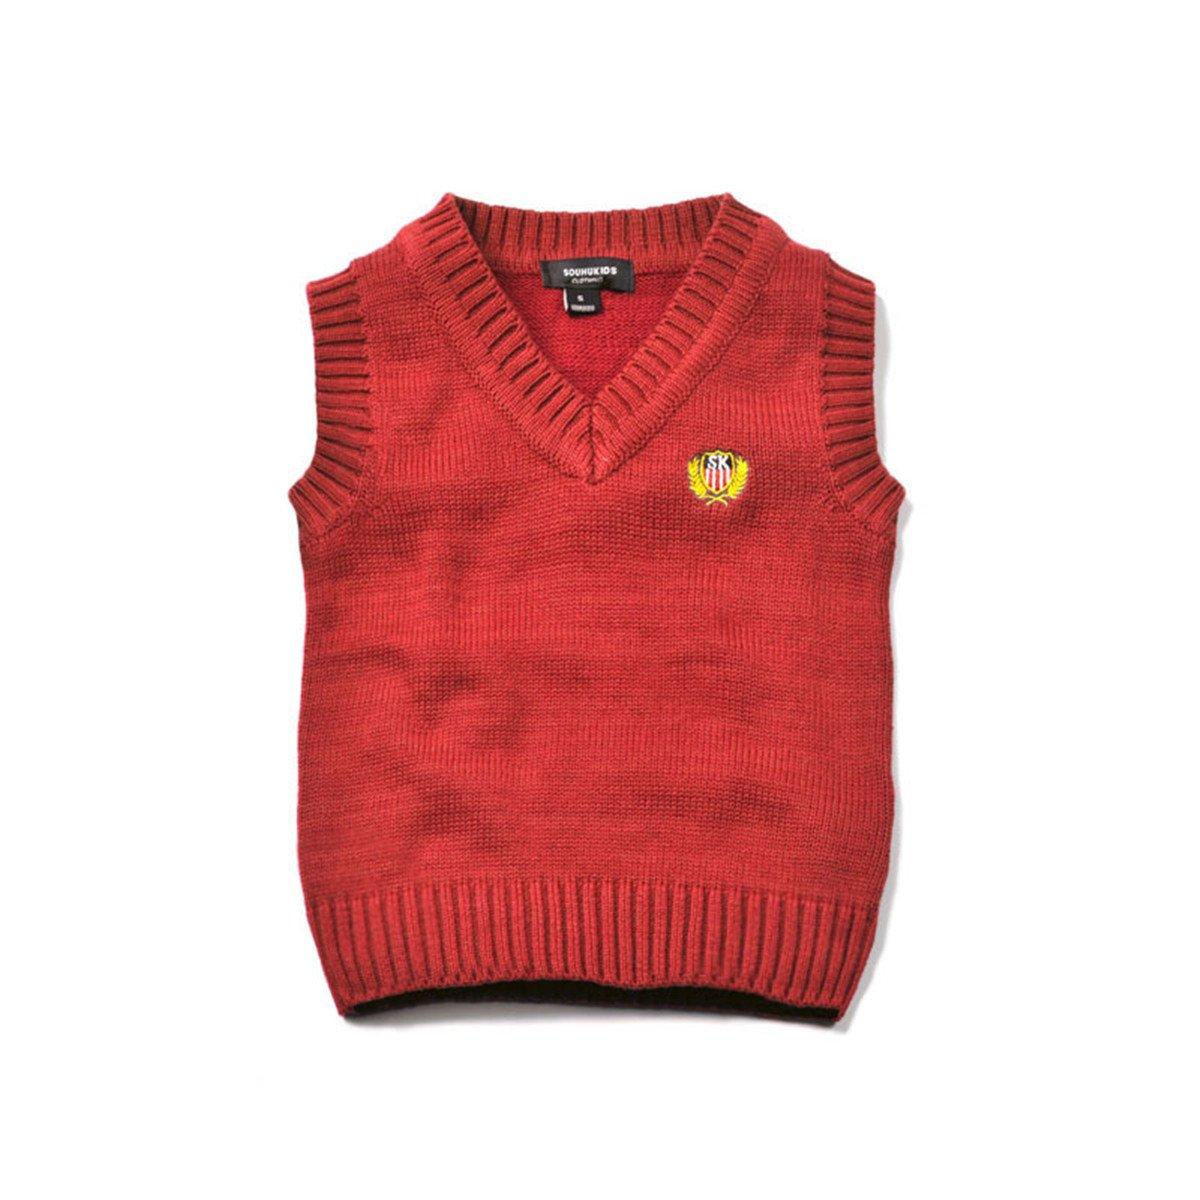 Baby Boys Girls Toddler V-Neck Solid Color Pullover Sweater Students Vest